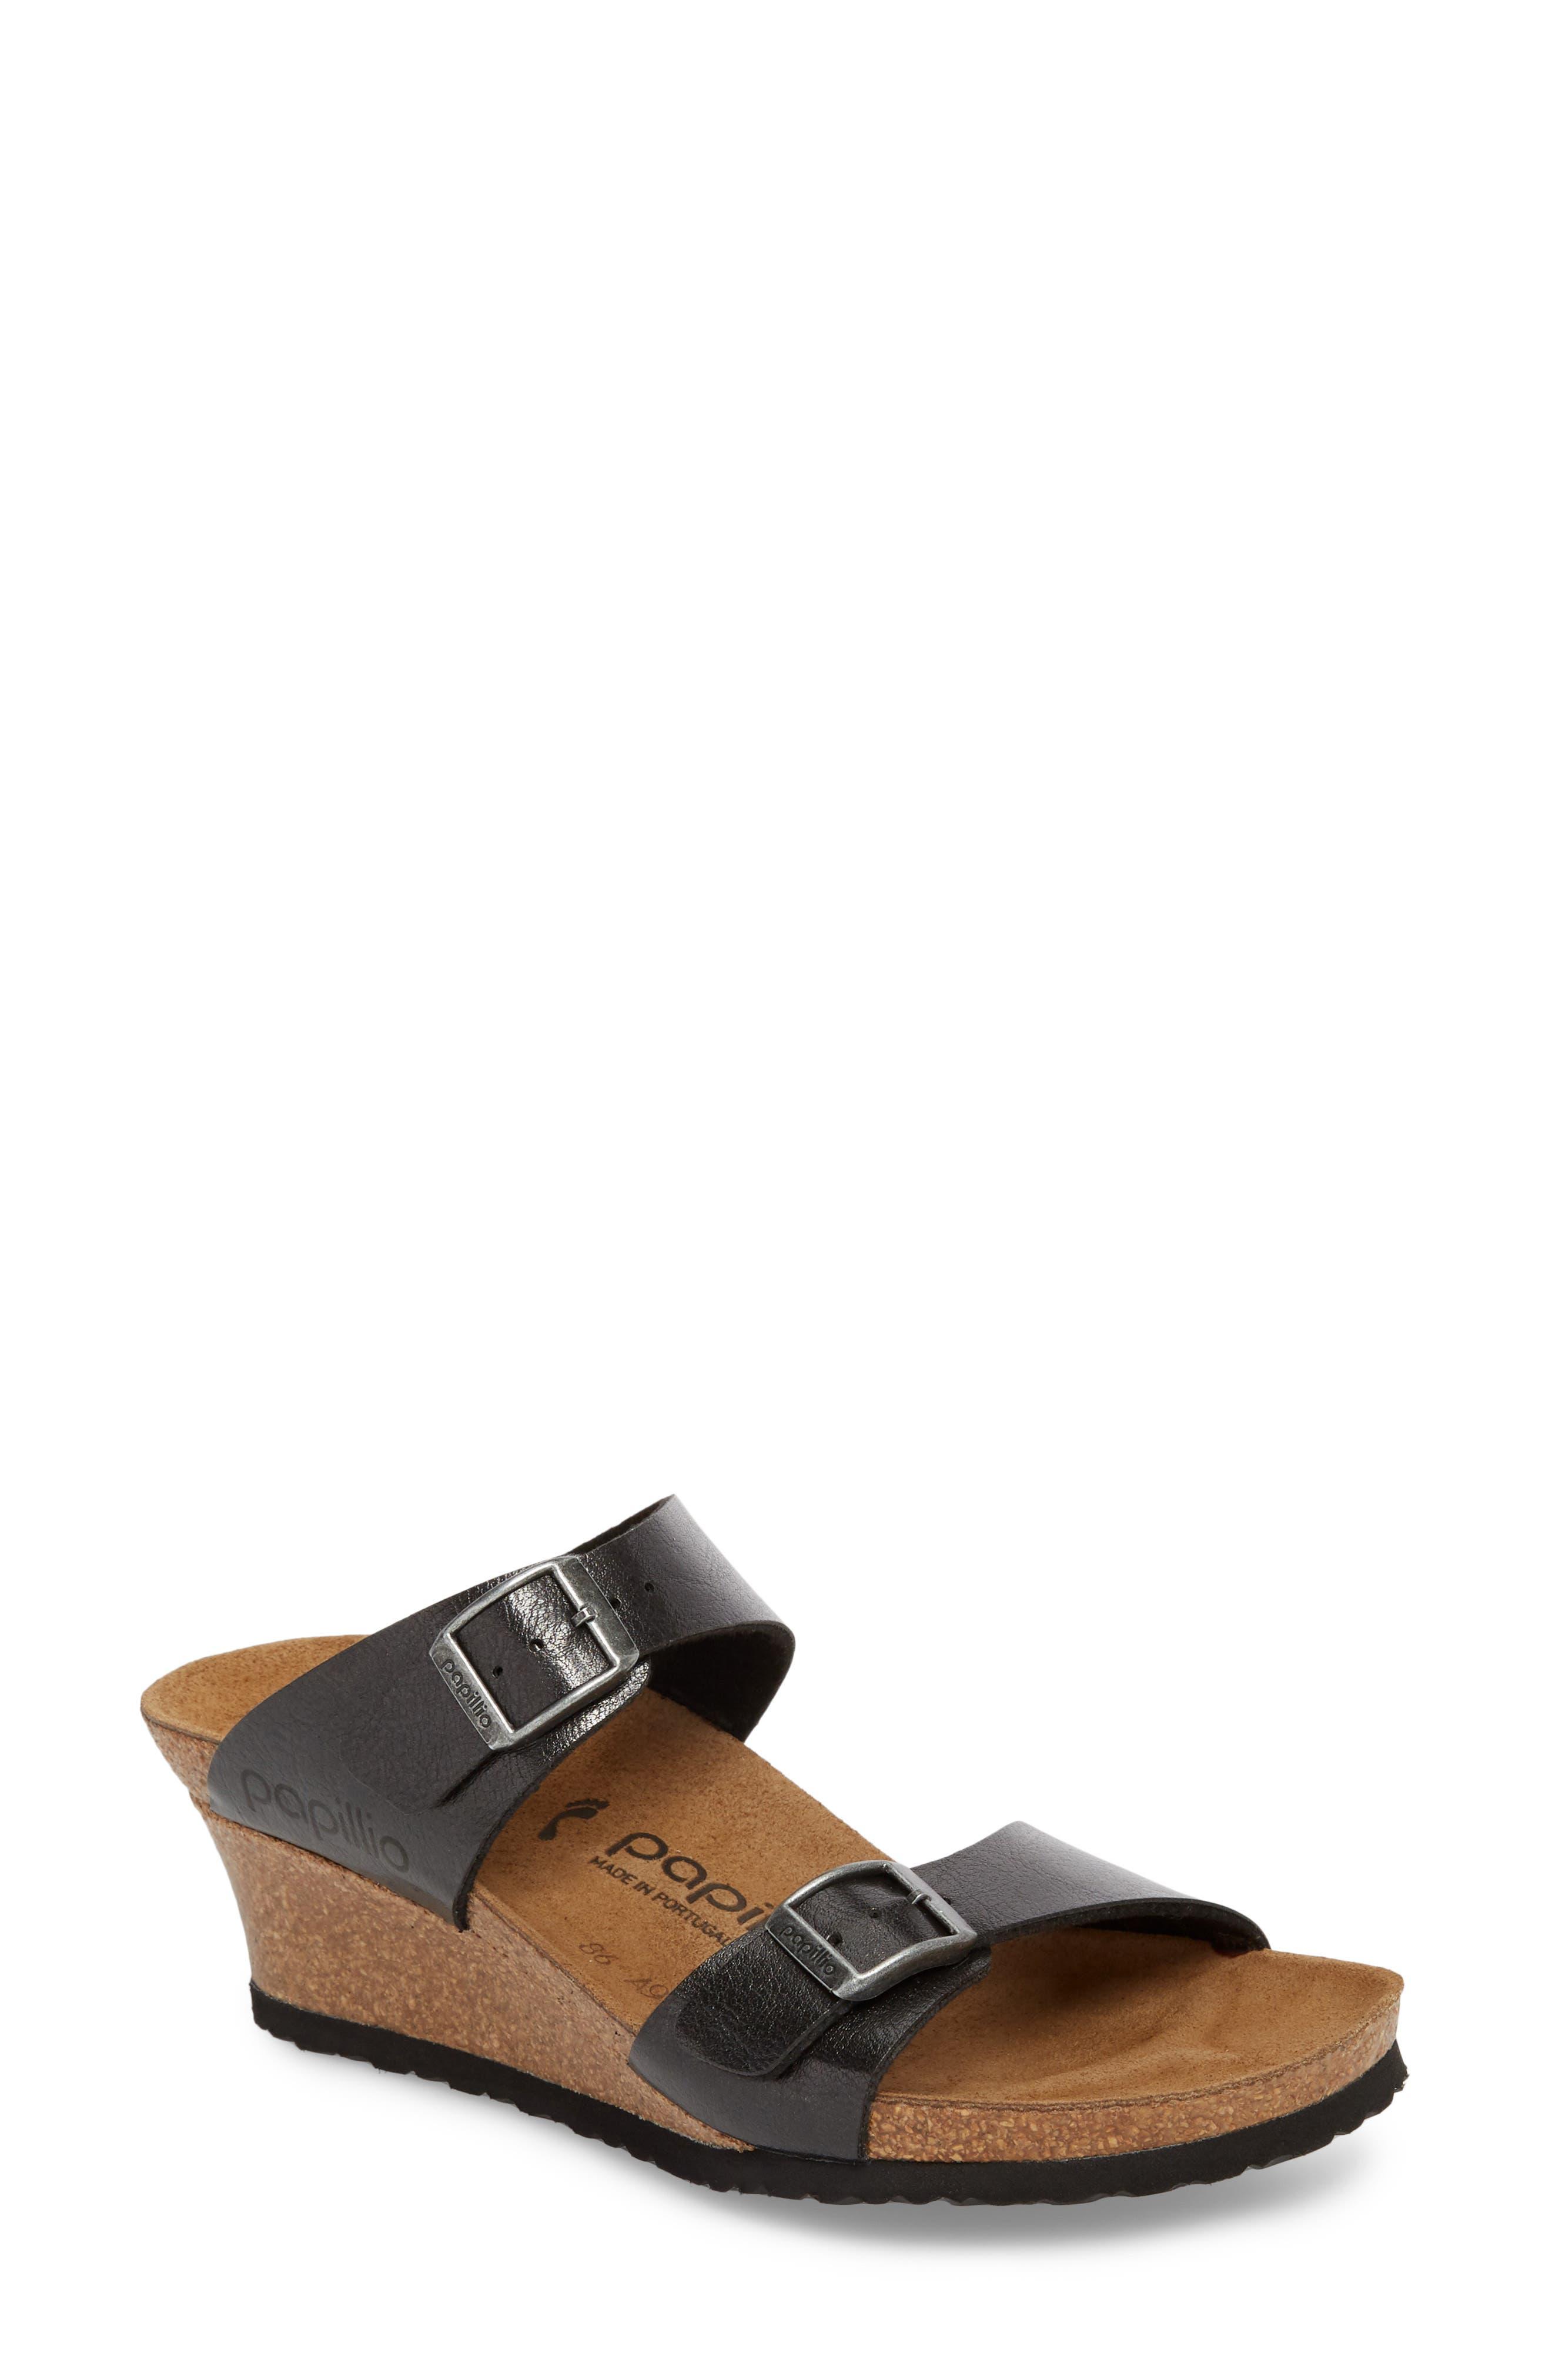 Papillio by Birkenstock Dorothy Wedge Slide Sandal,                         Main,                         color,